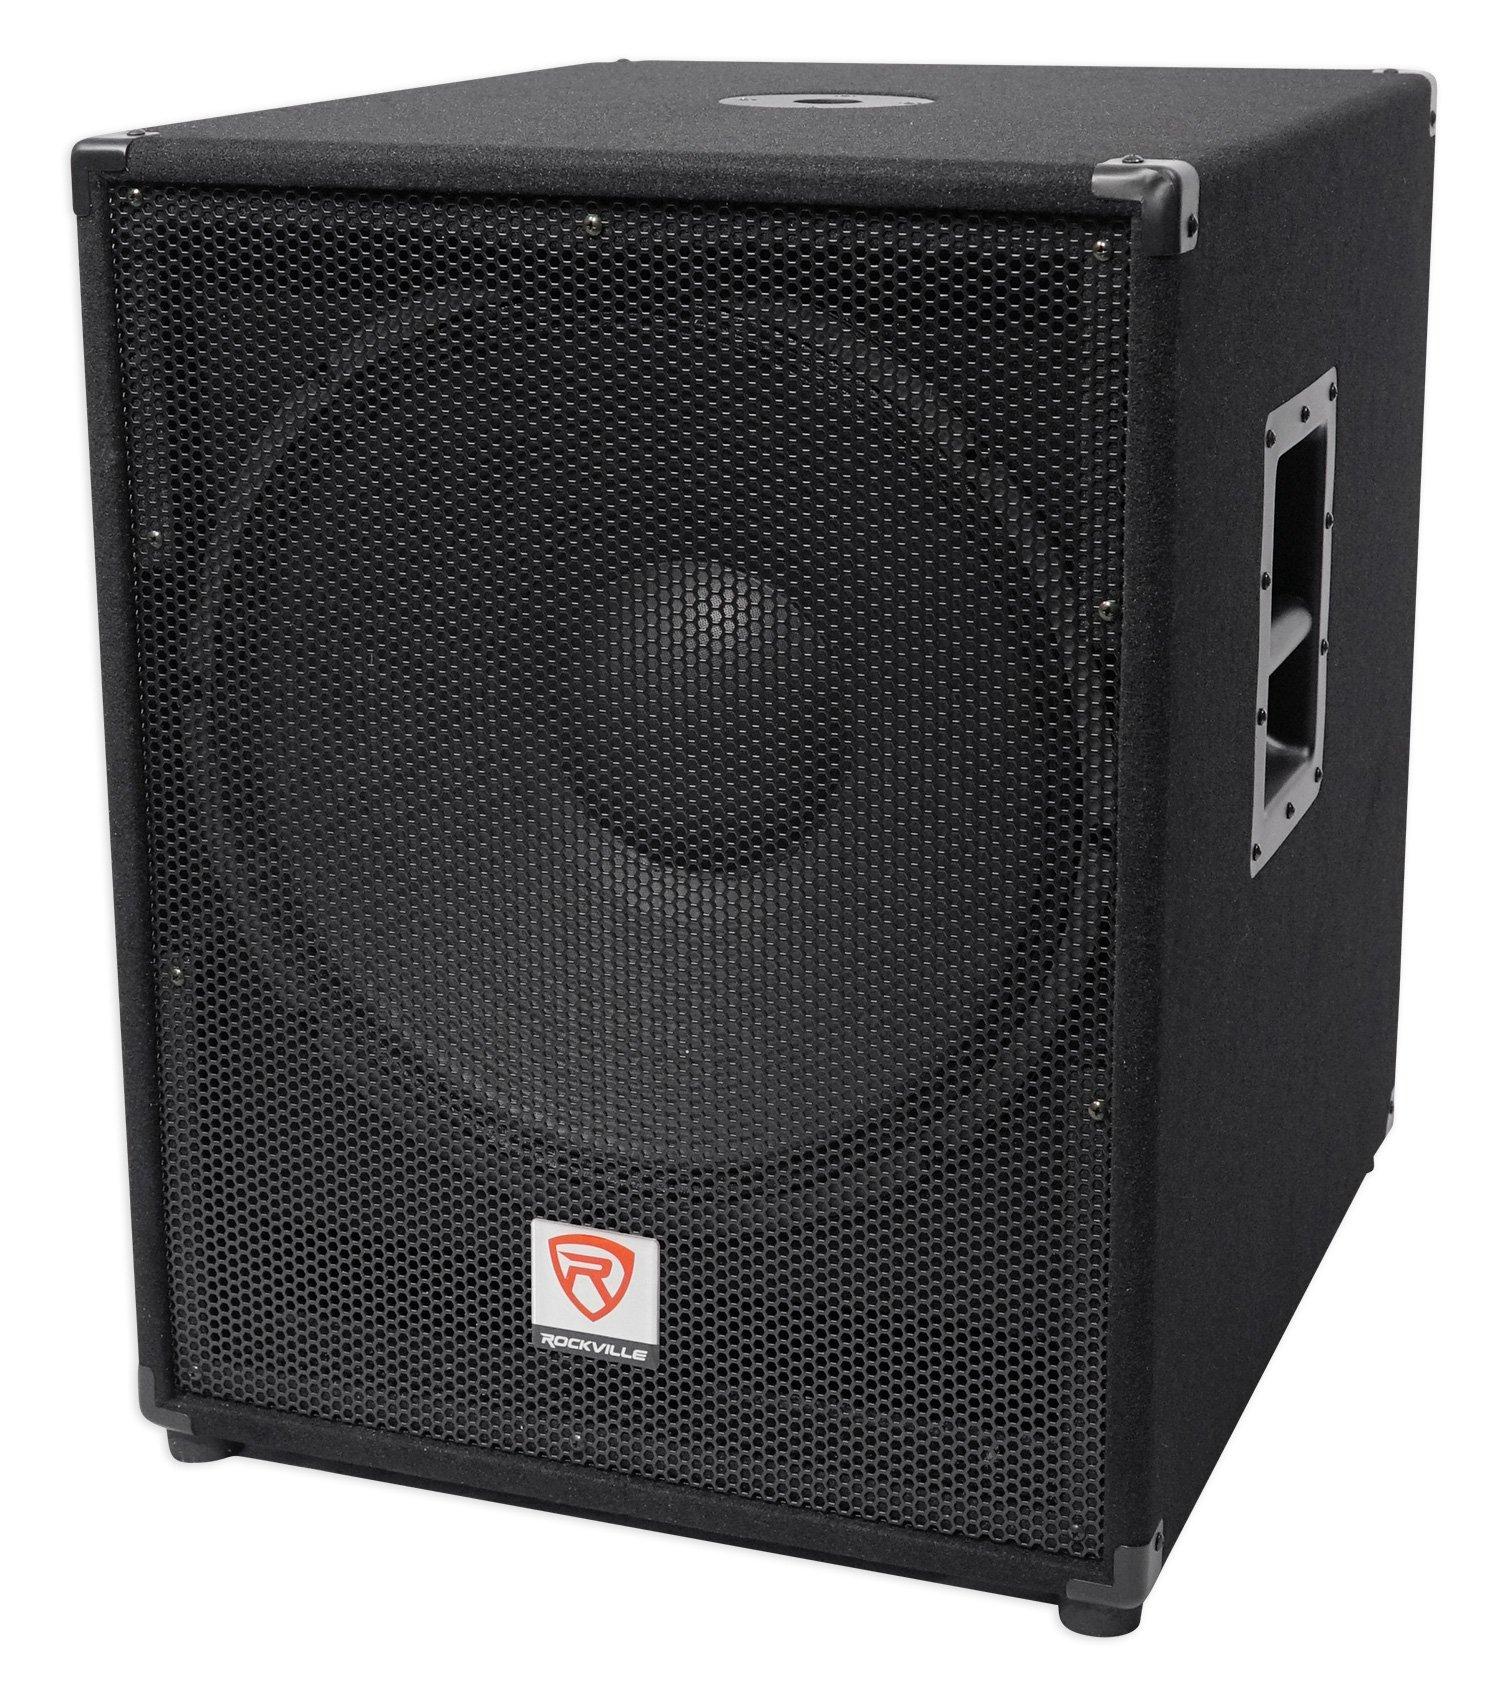 Rockville PBG18 18'' Passive 2000 Watt 8 Ohm Pro Audio Subwoofer Sub/MDF Cabinet